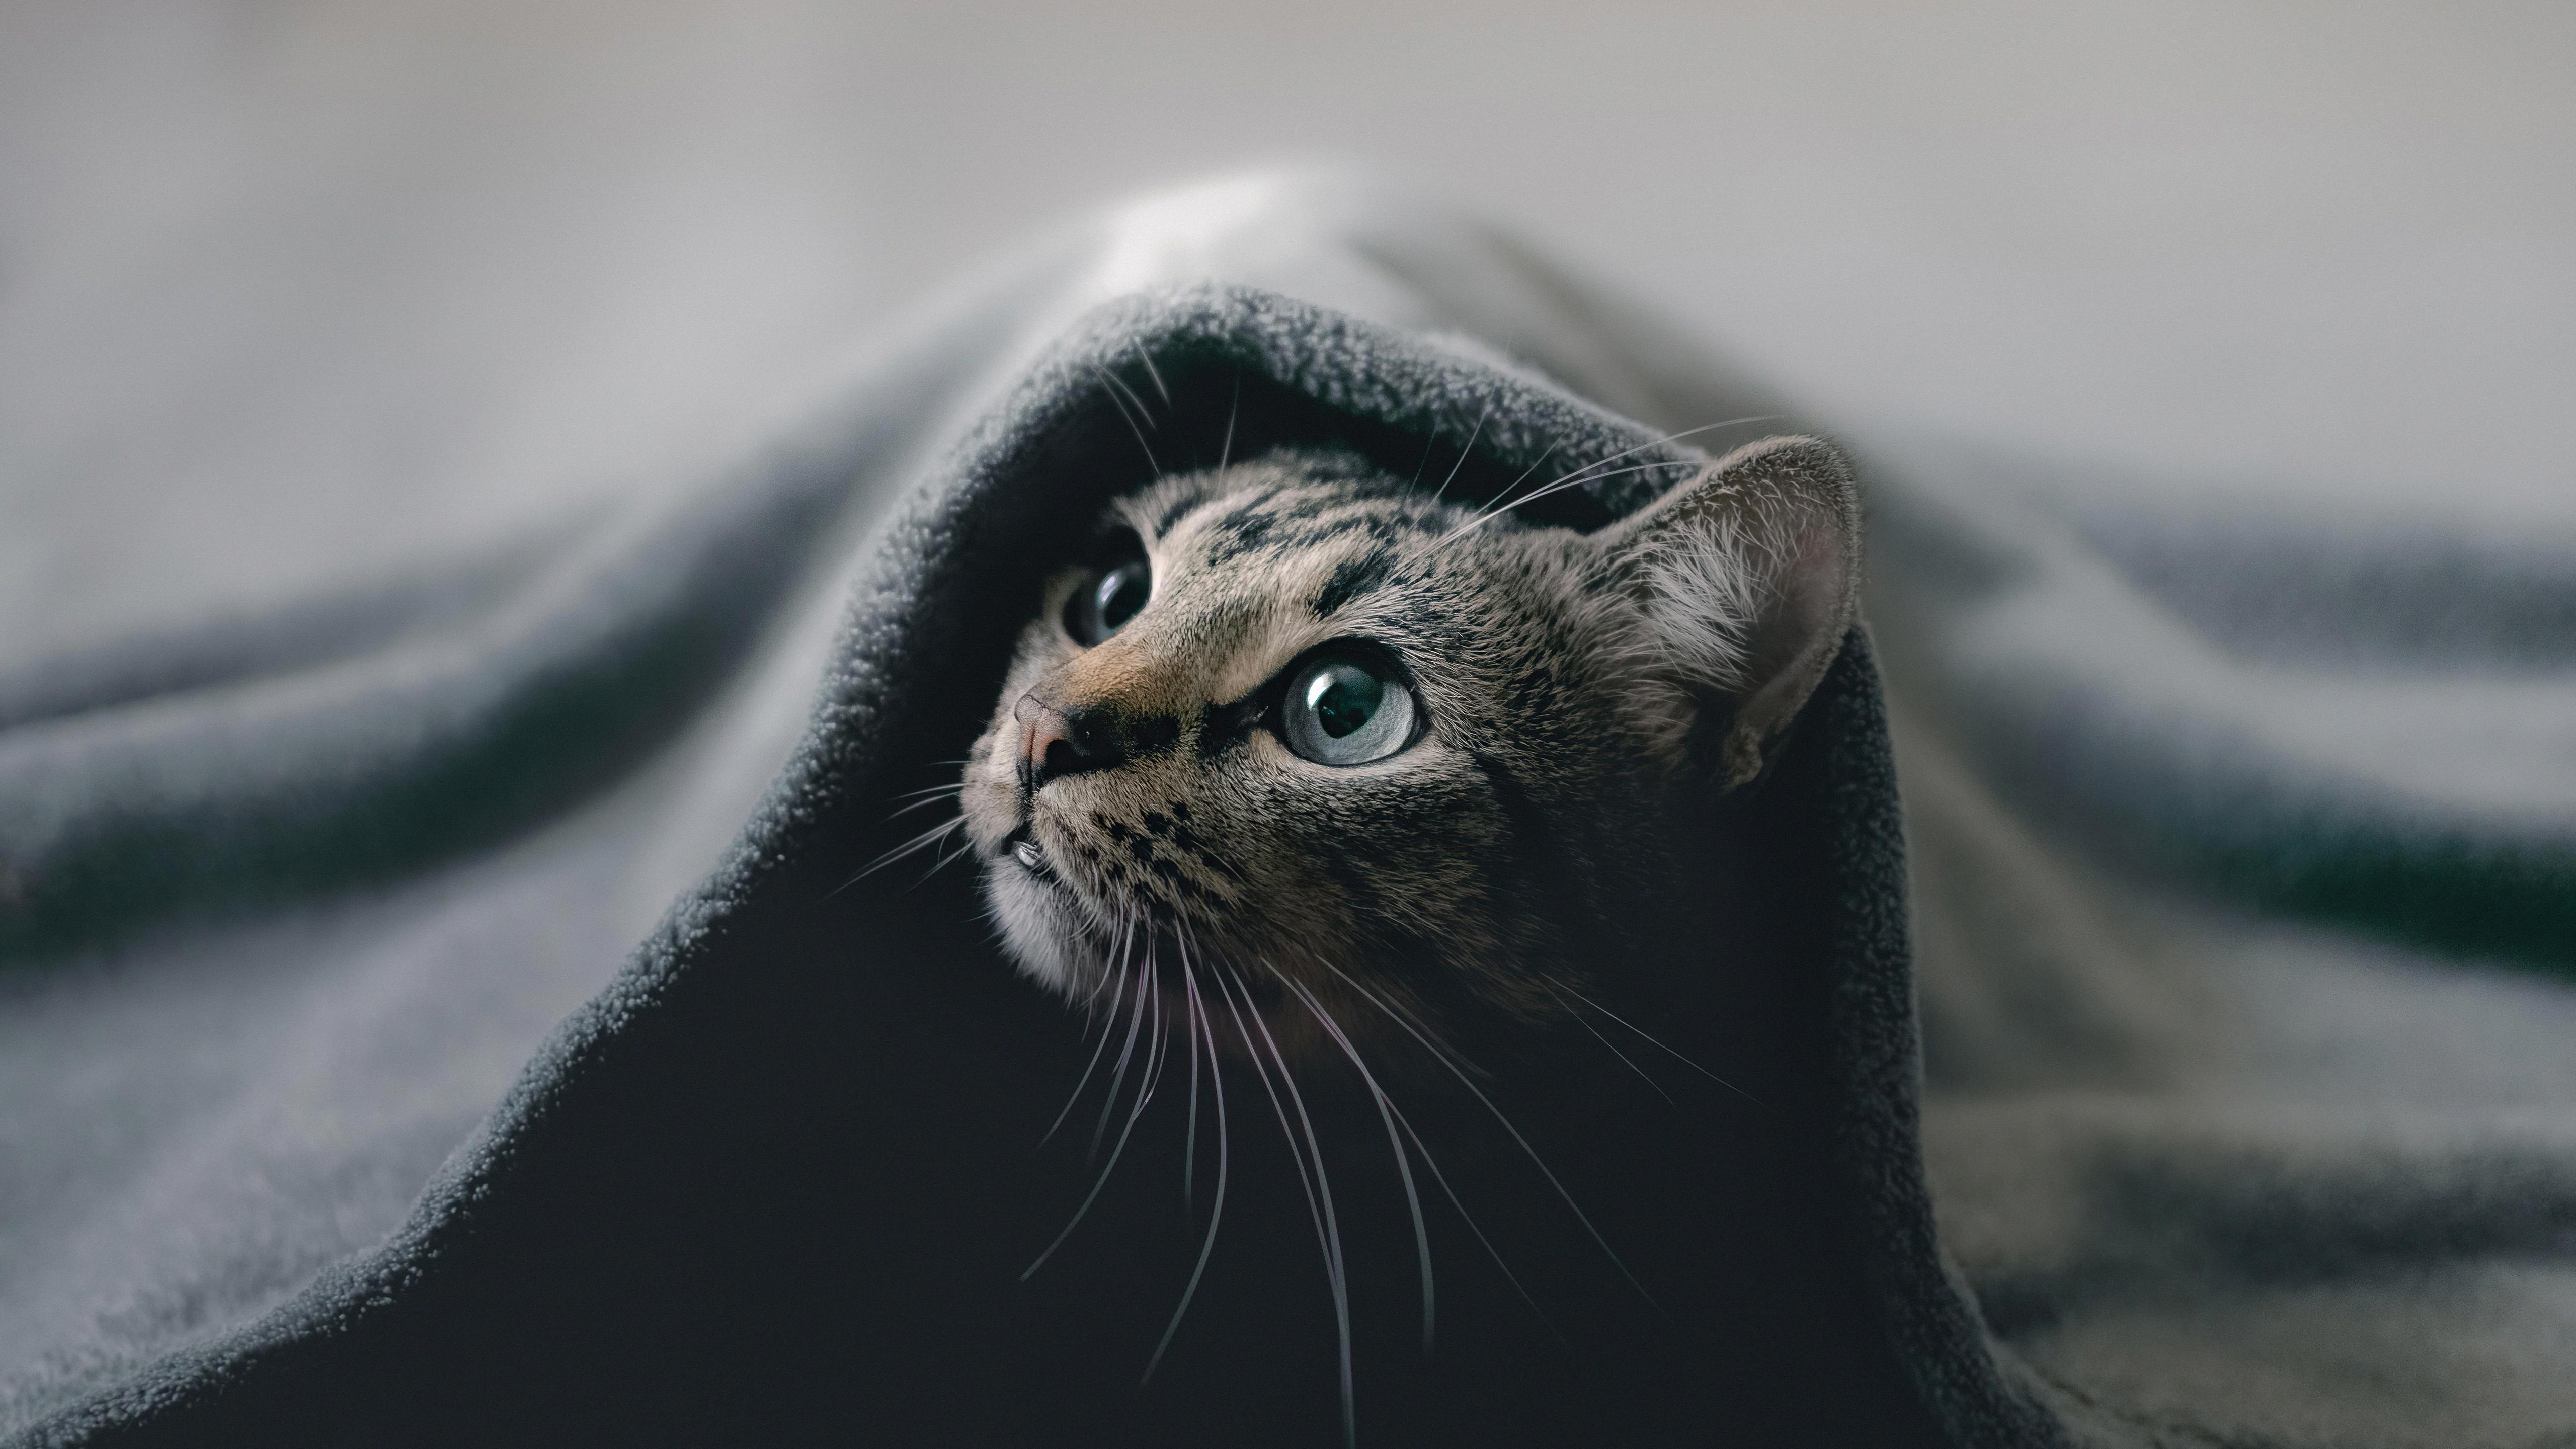 cat hideout 4k 1616873300 - Cat Hideout 4k - Cat Hideout 4k wallpapers